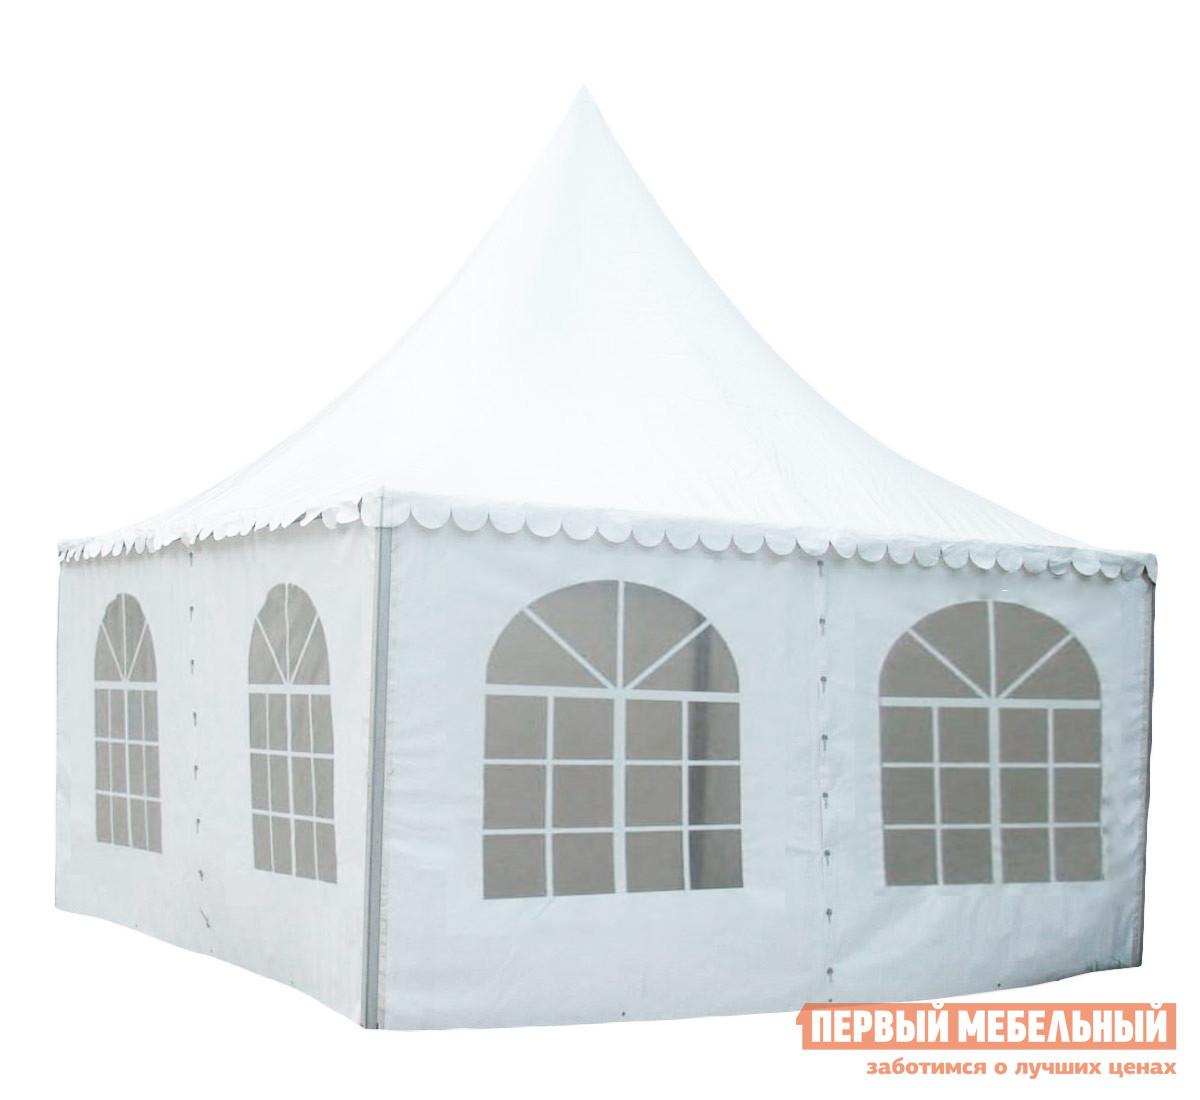 купить Шатер-пагода для мероприятий Giza Garden Азарина 6х6 недорого